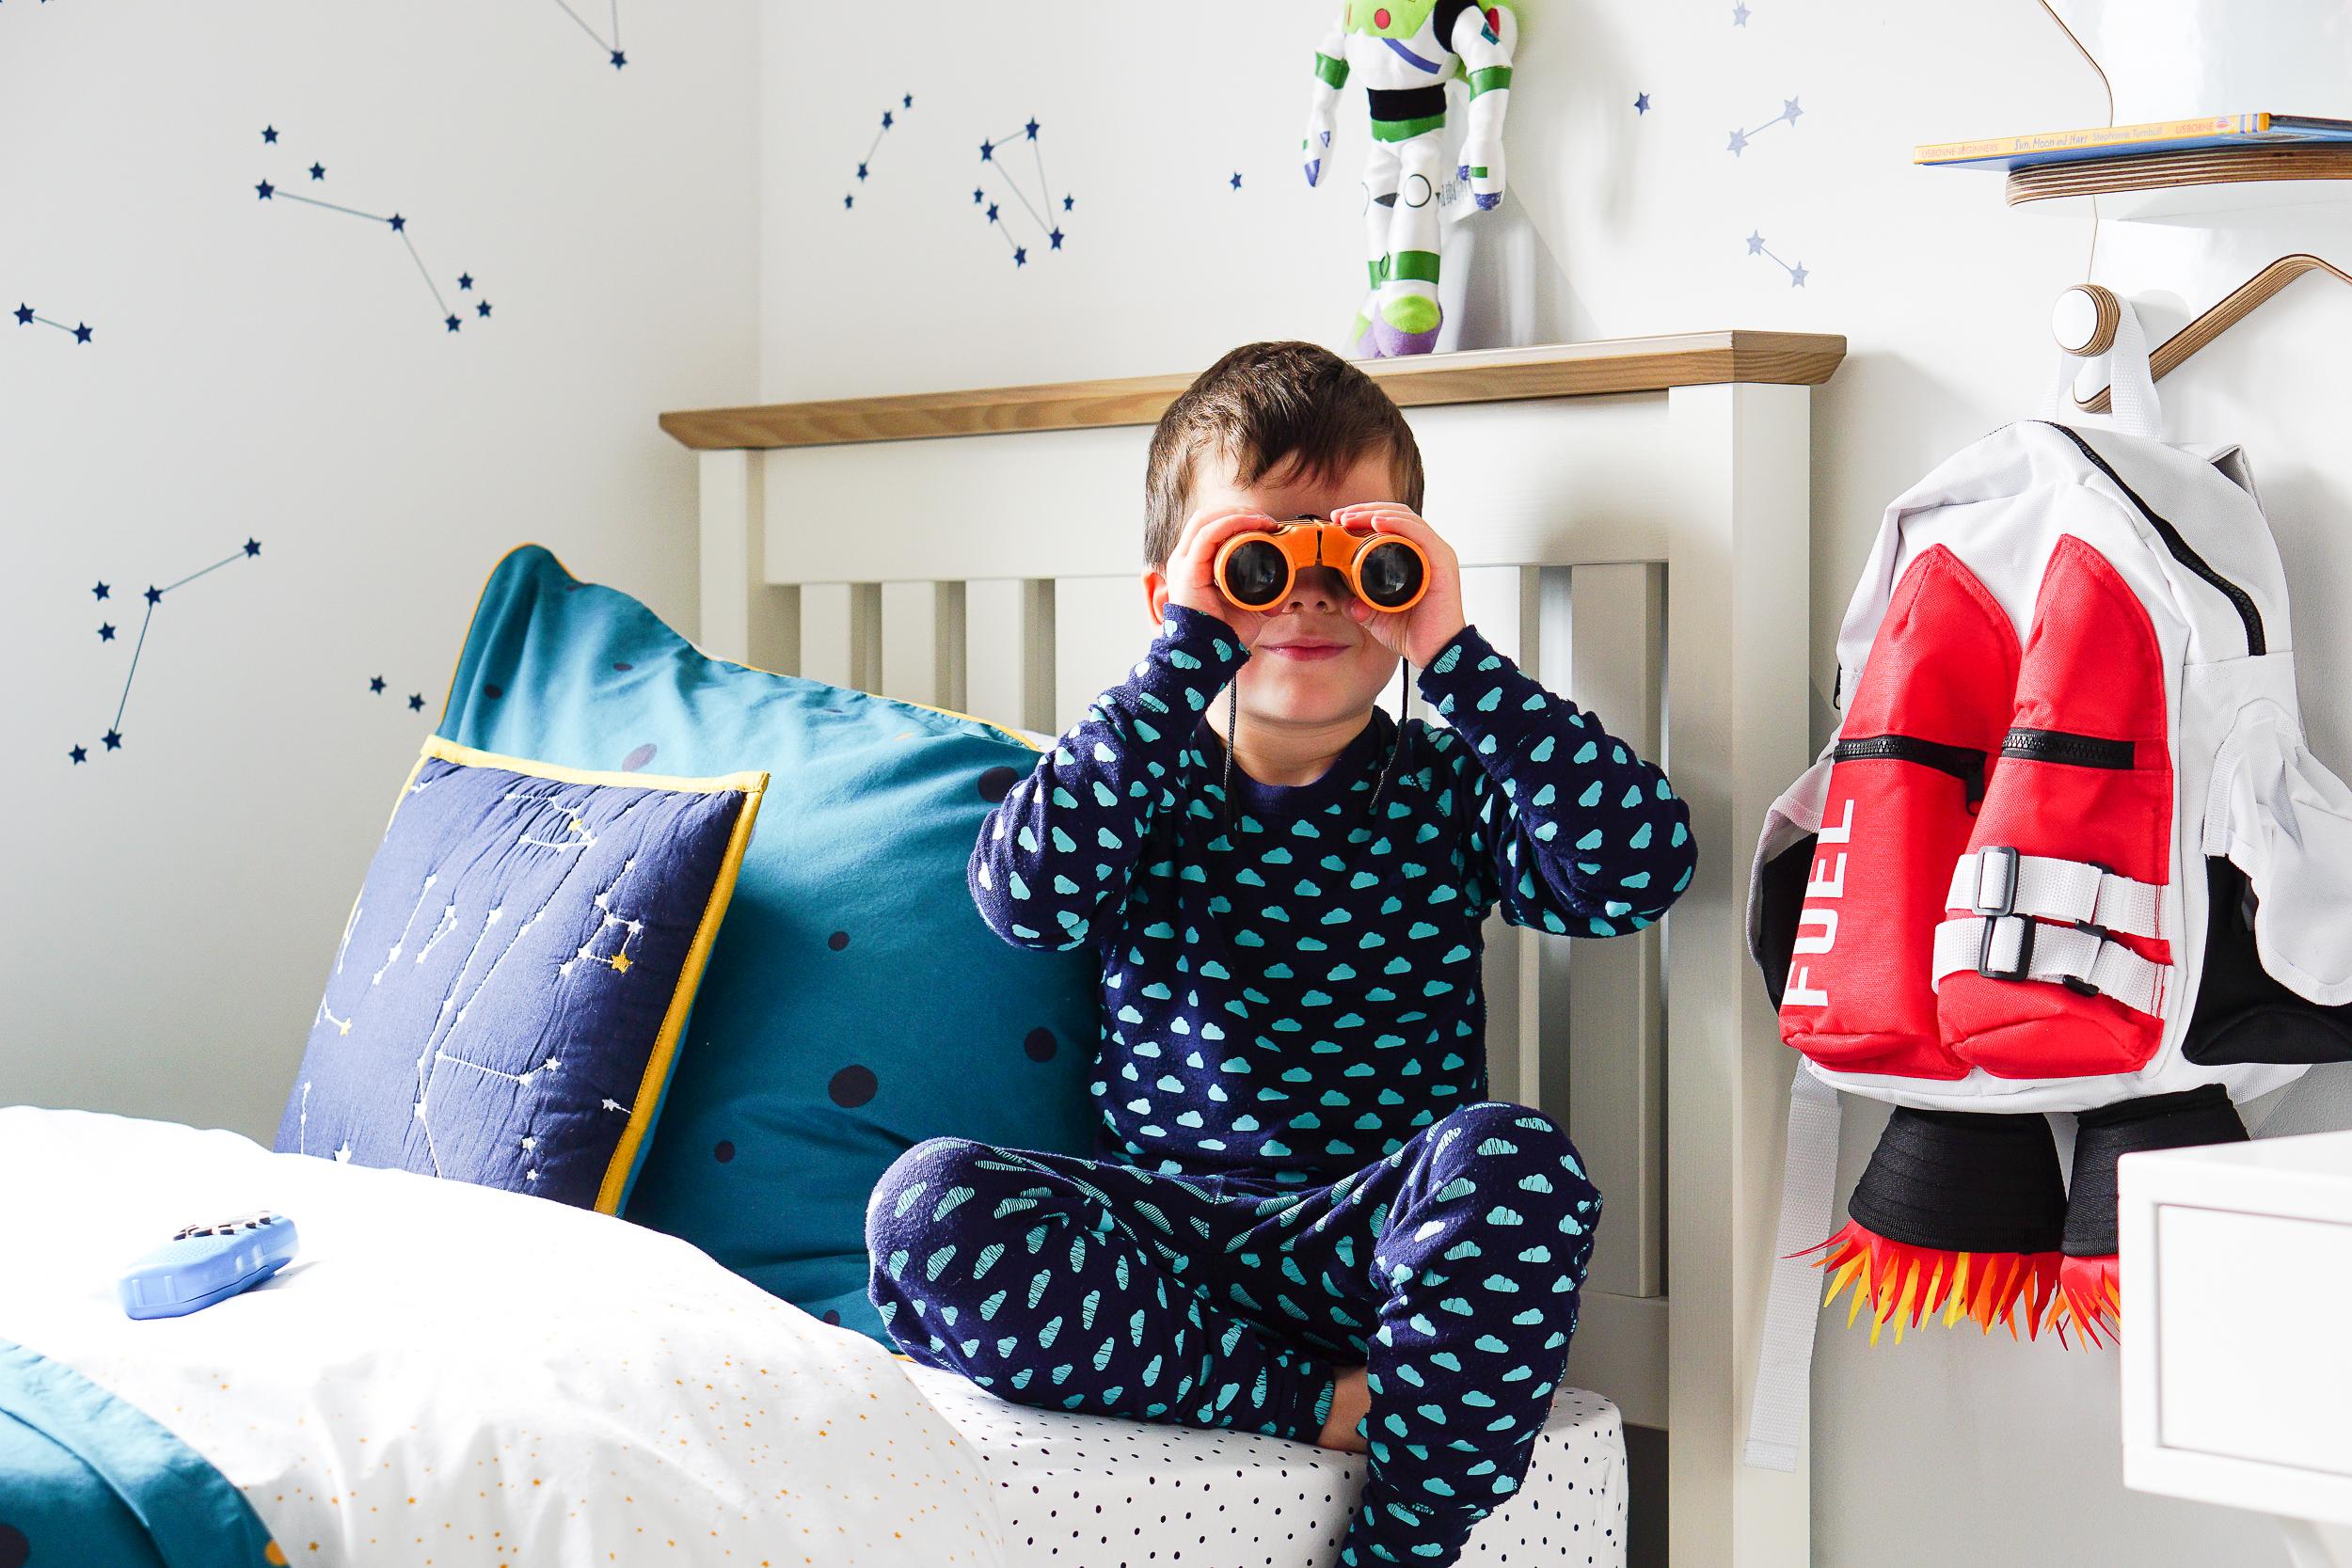 Children's rooms for little galactic explorers